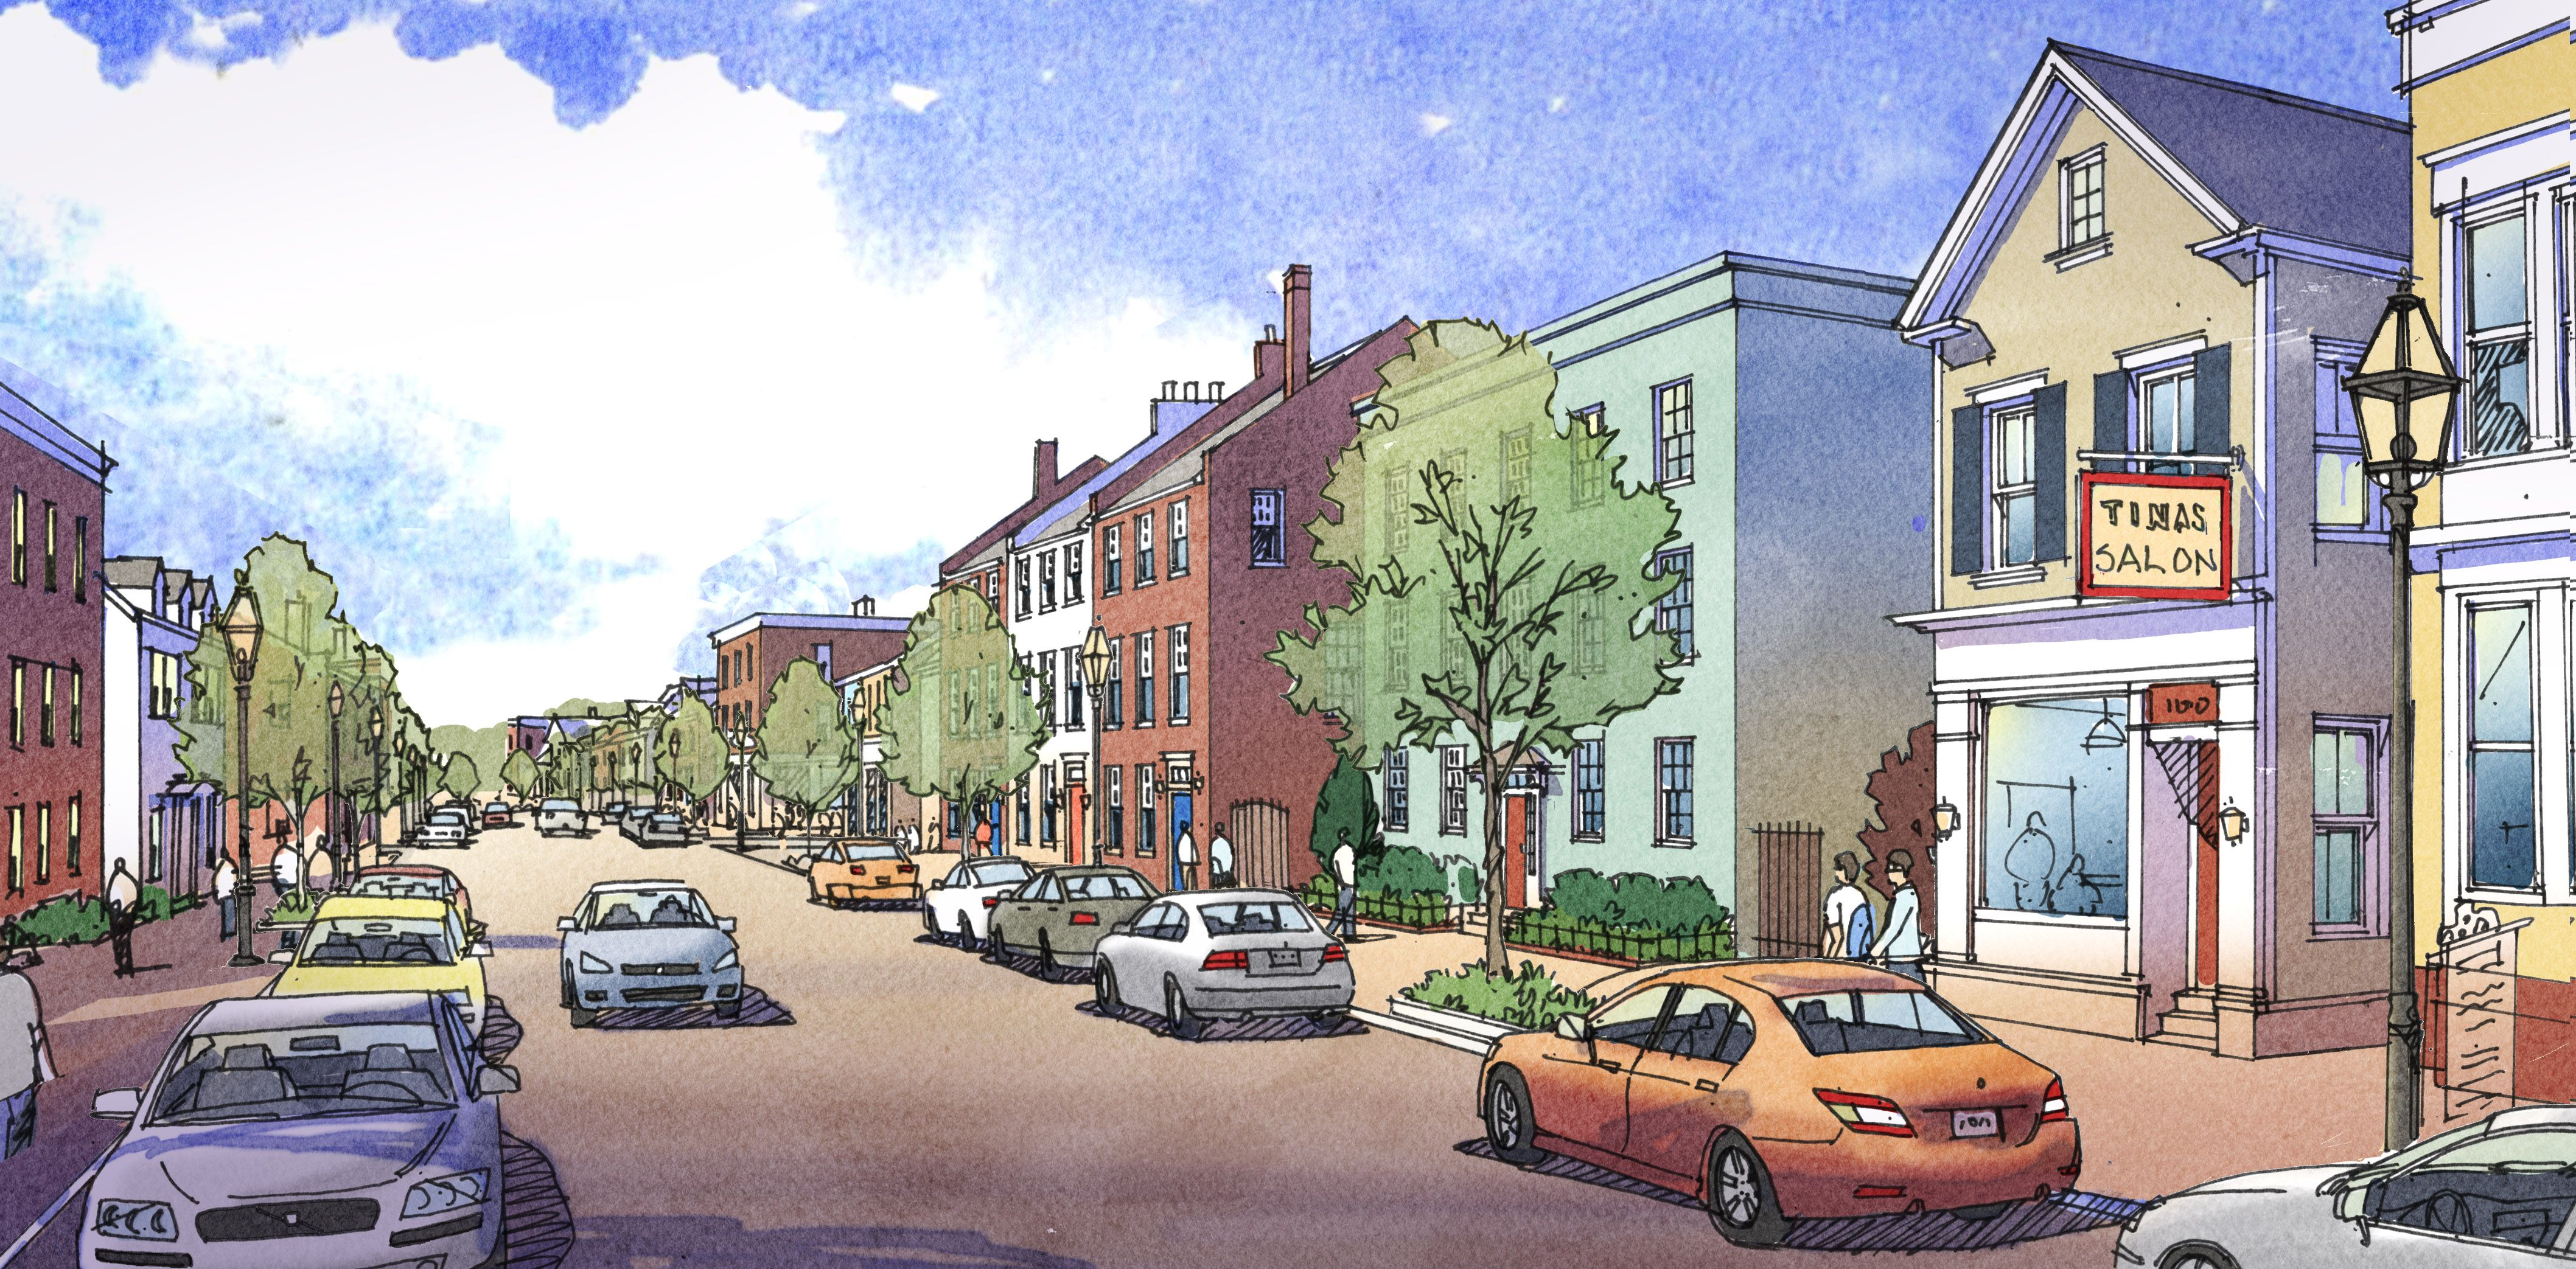 Mixed Use 'Main Street' Development Concept | TPUDC | Town Planning & Urban Design Collaborative